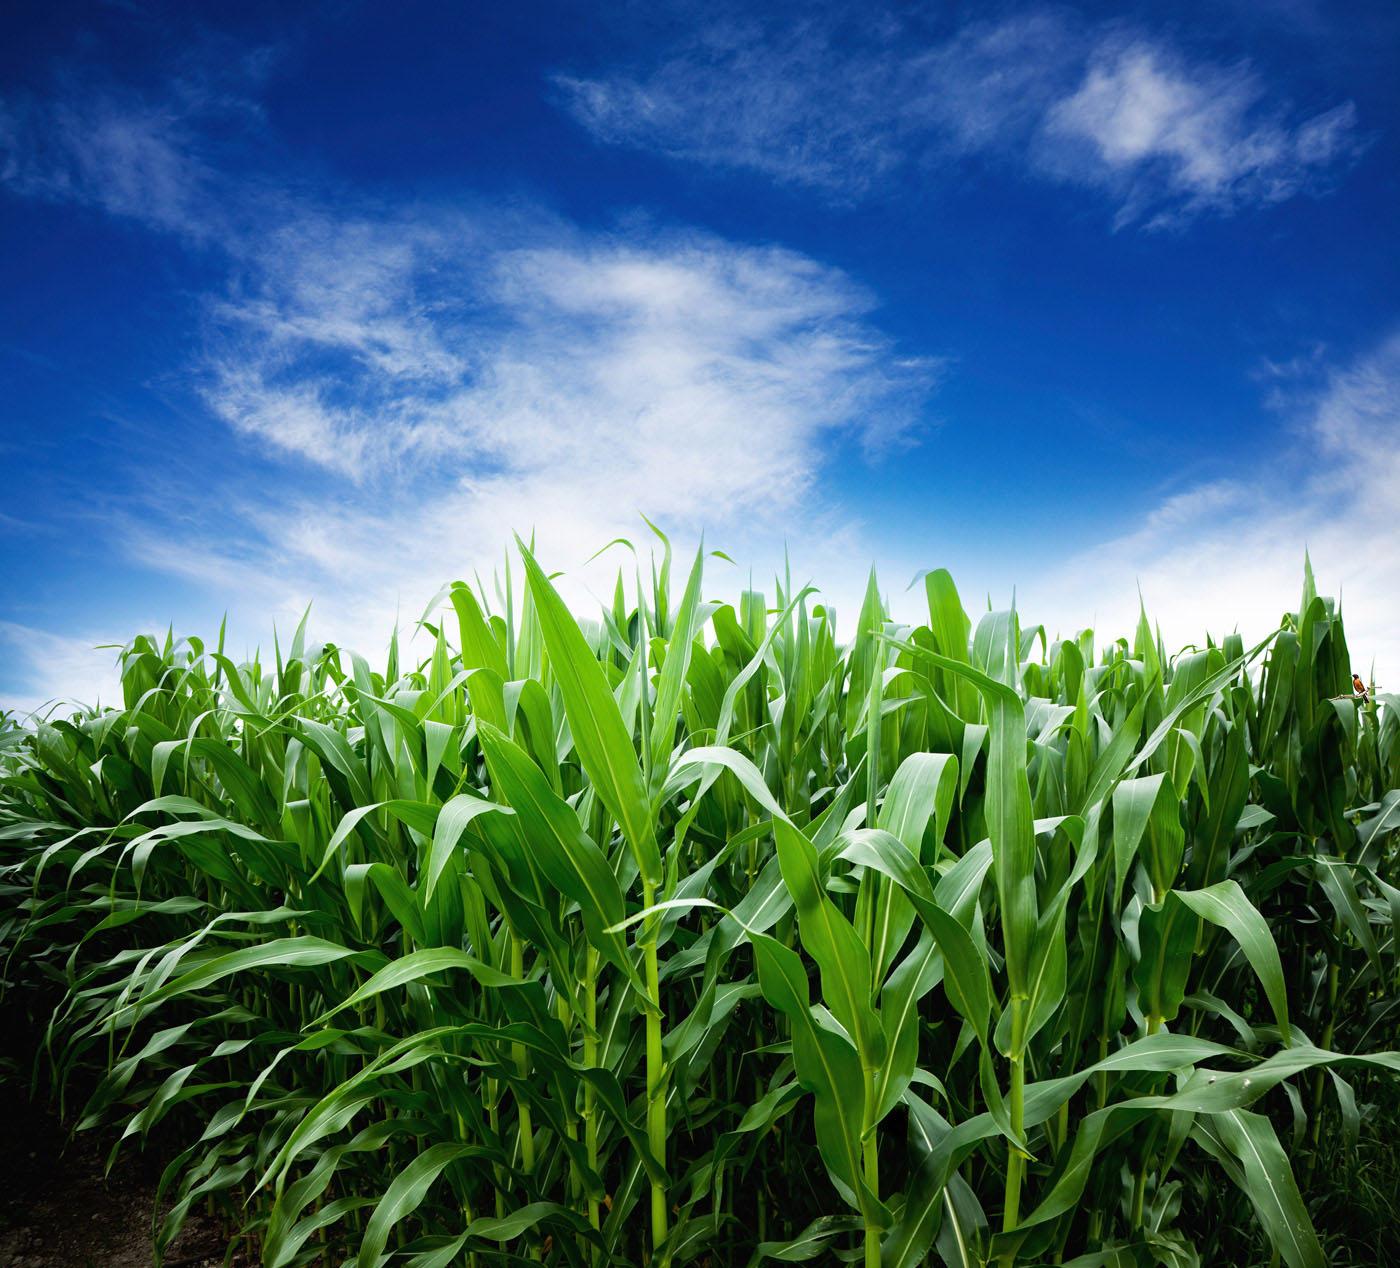 corn field plants against blue cloudy sky